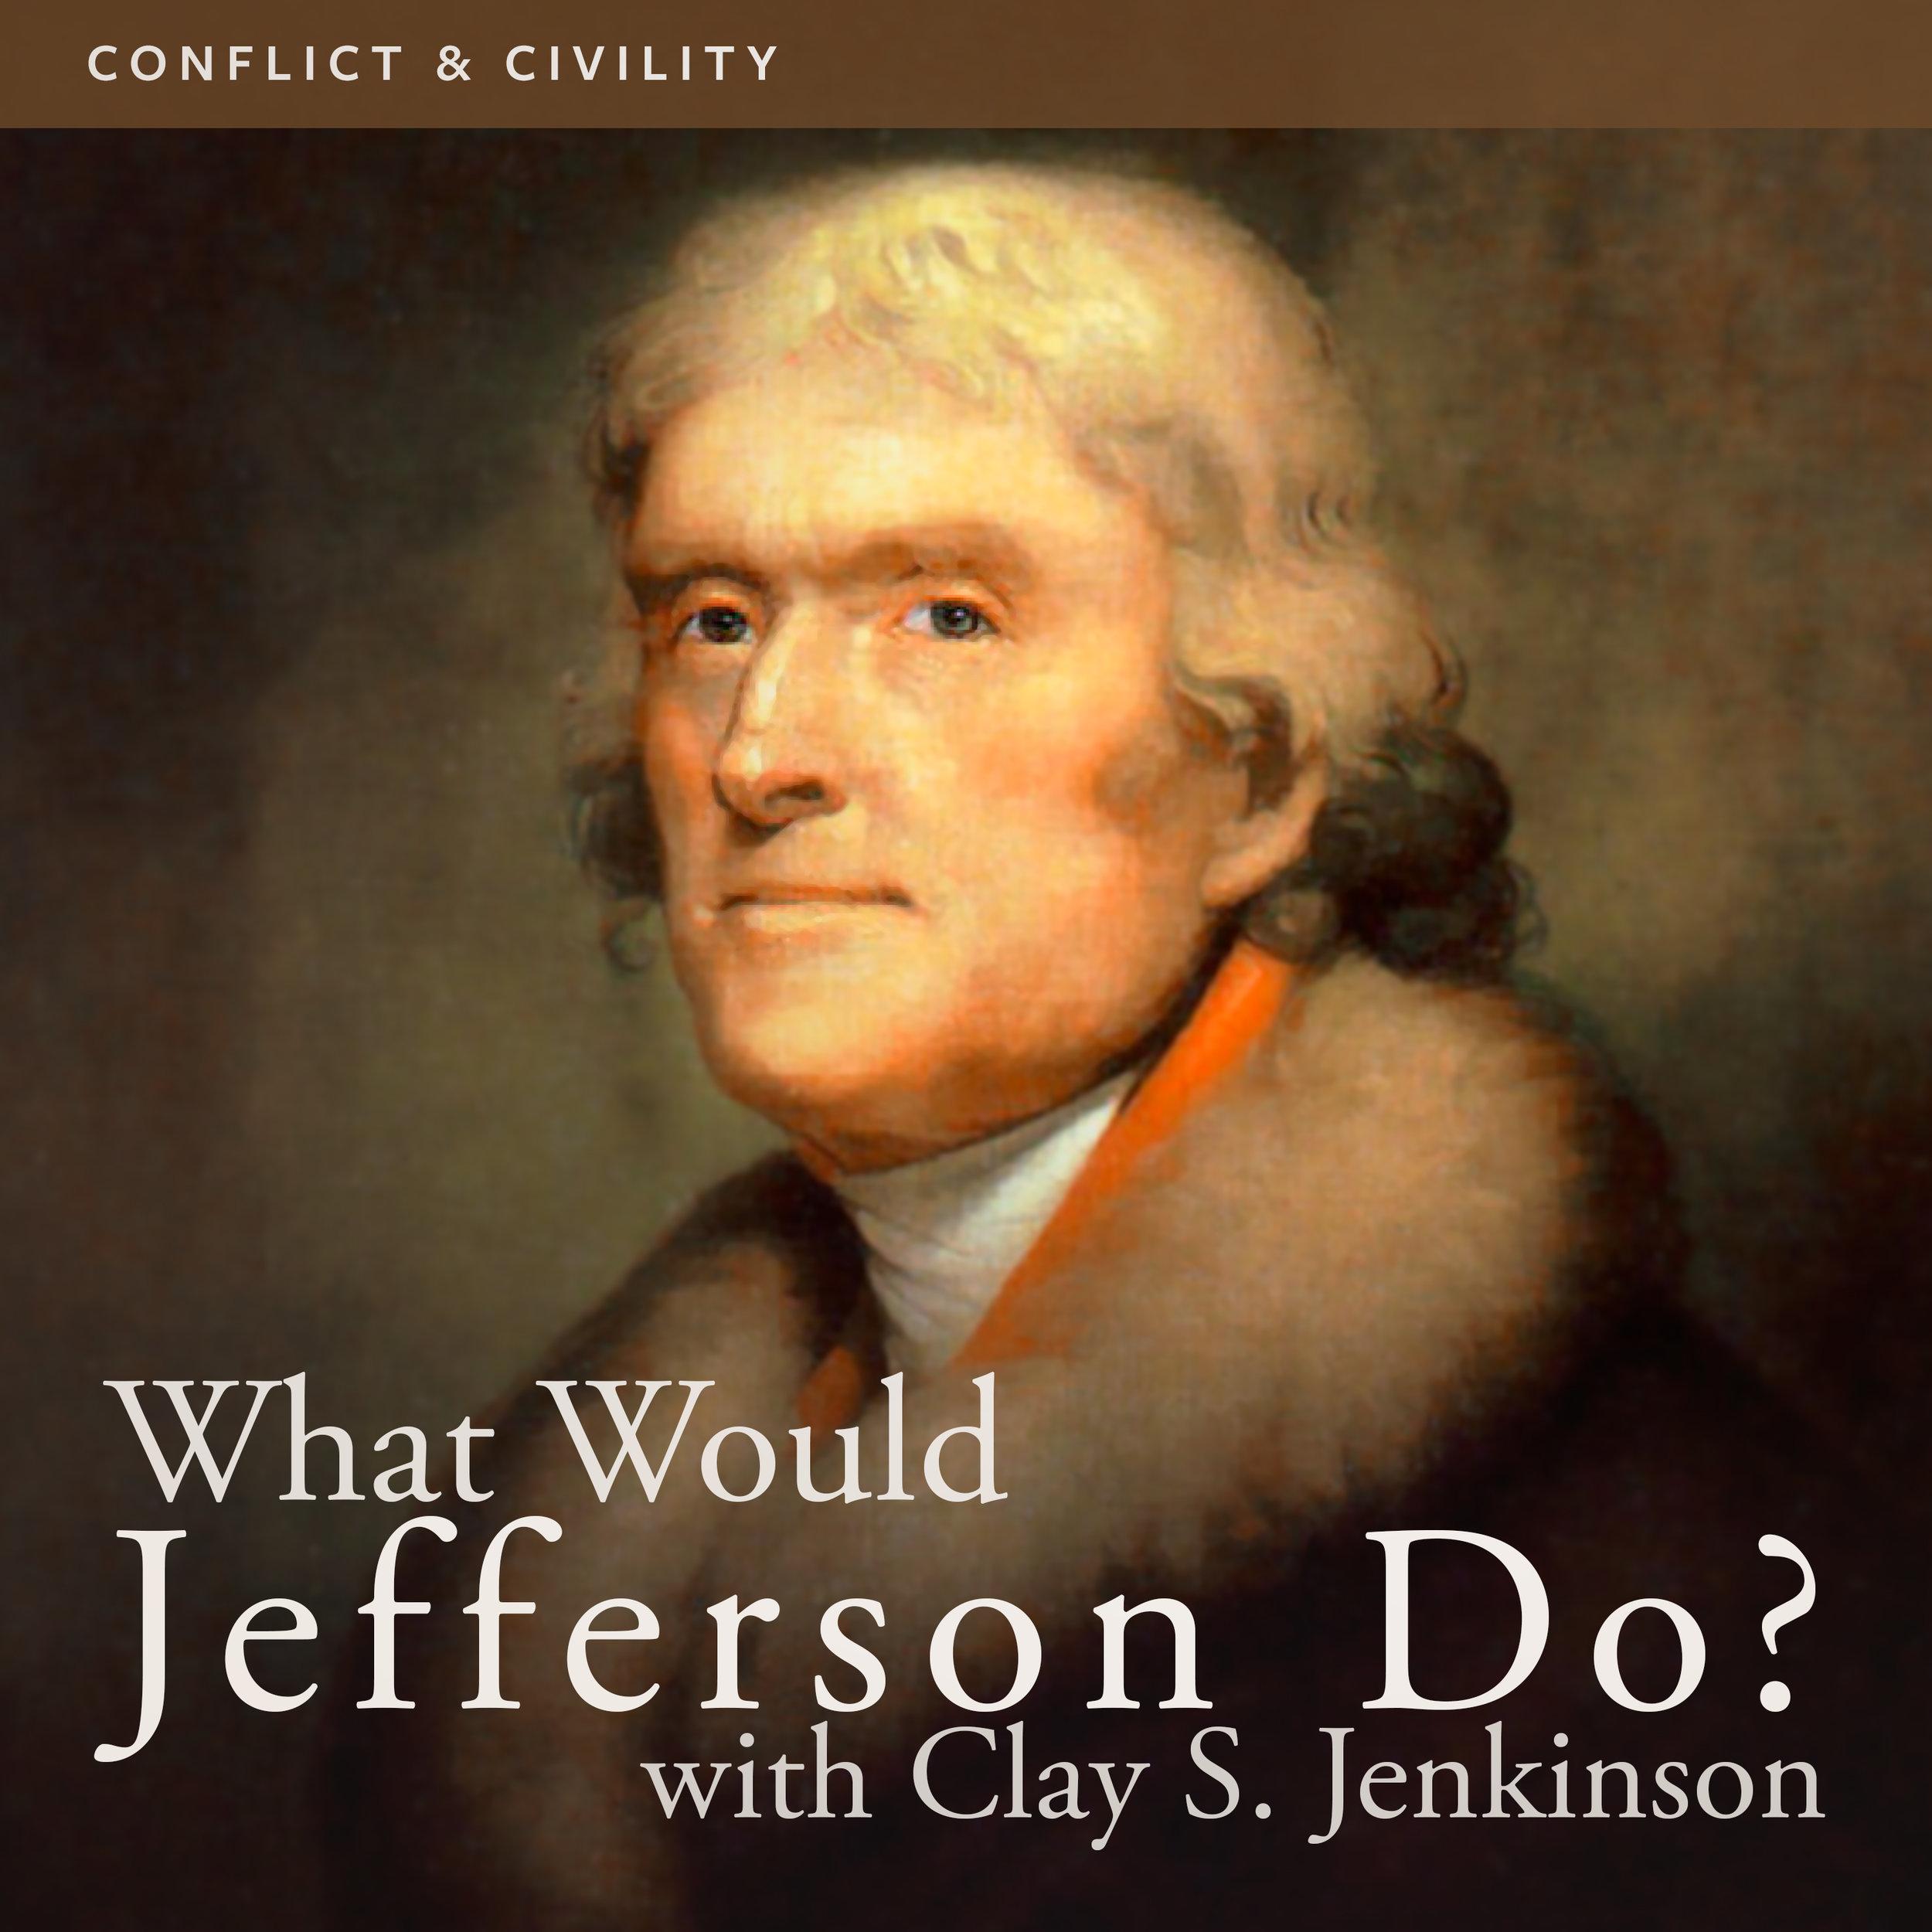 WWTJD_1258 Conflict & Civility.jpg